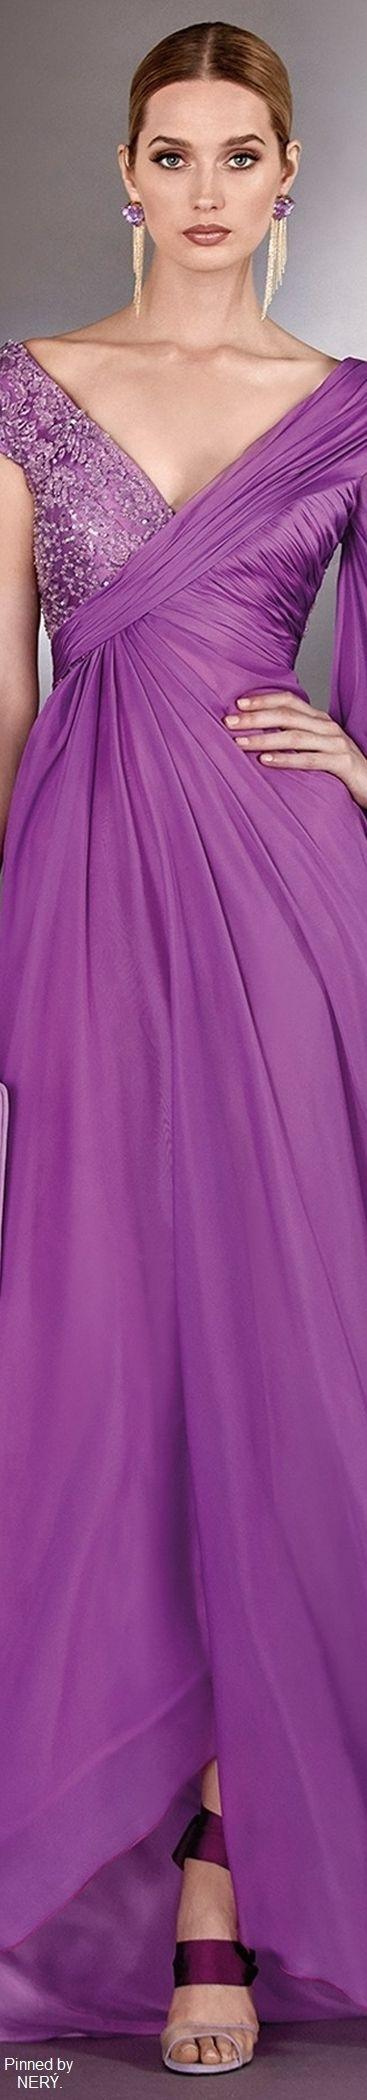 173 best TRAJES DE FIESTA images on Pinterest | Block dress, Classy ...